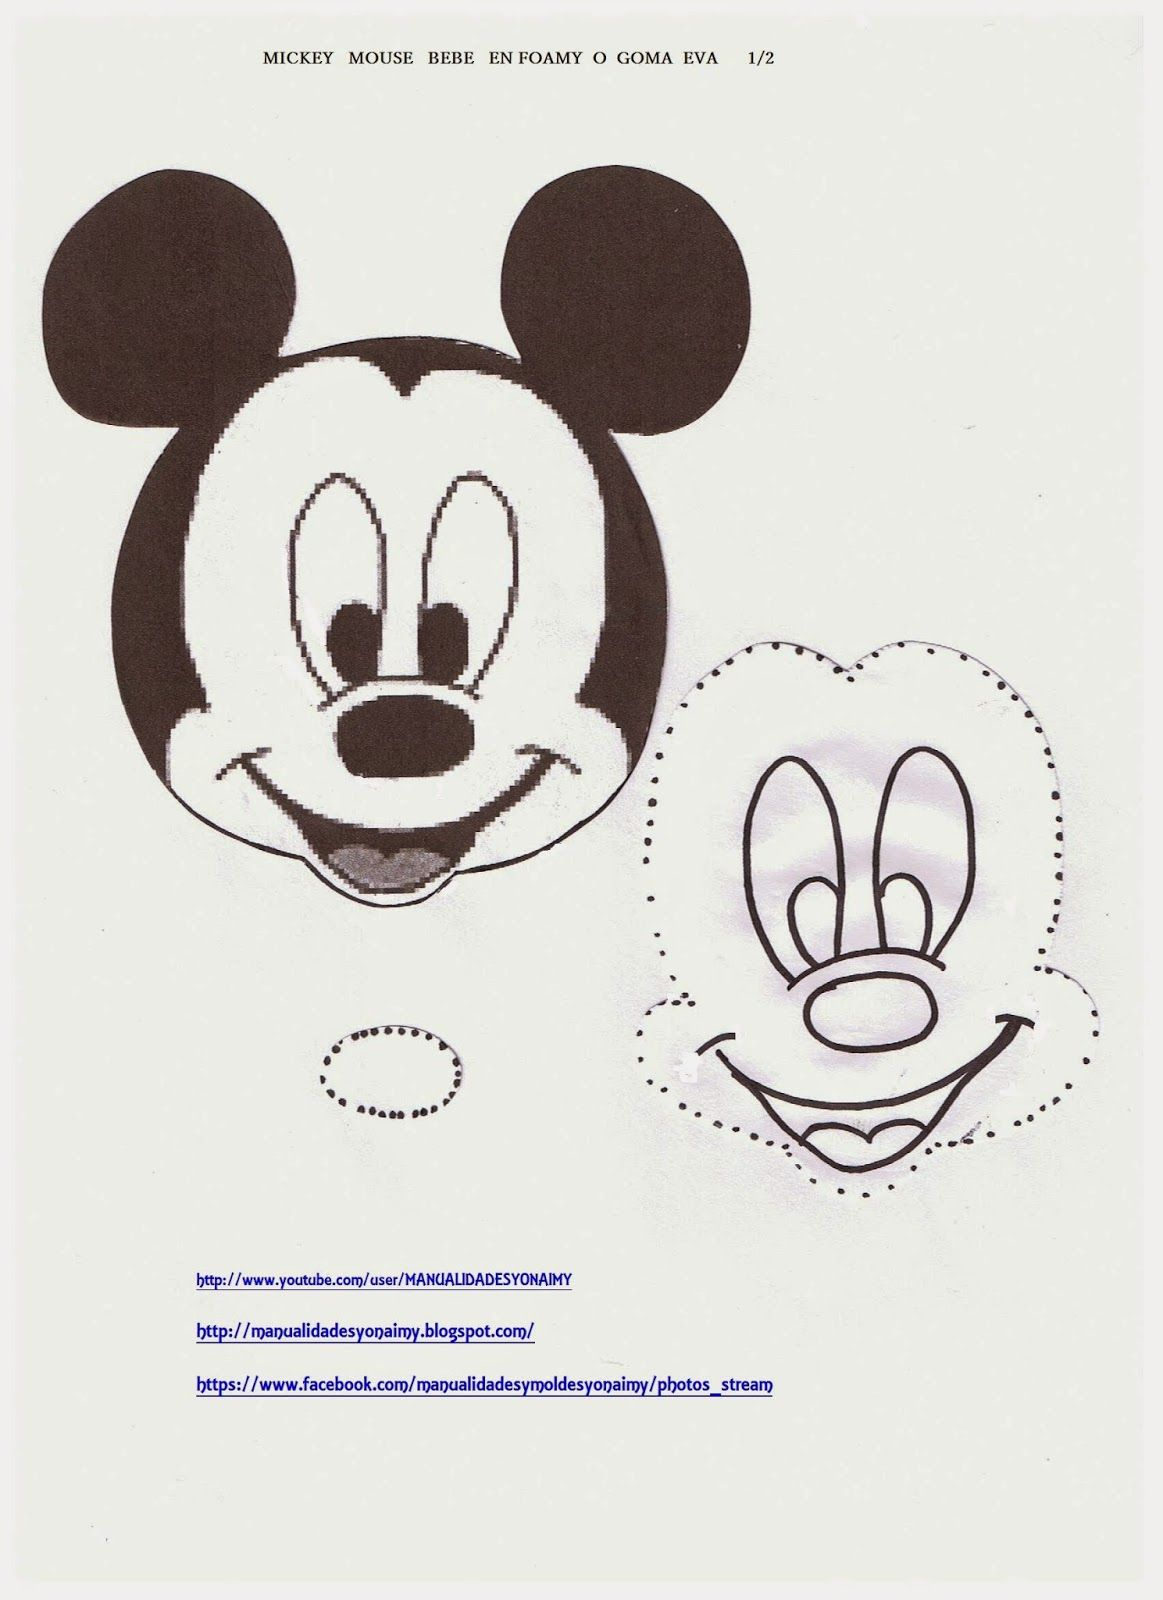 Manualidades Yonaimy En Goma Eva Pinterest Baby Mickey Fiesta